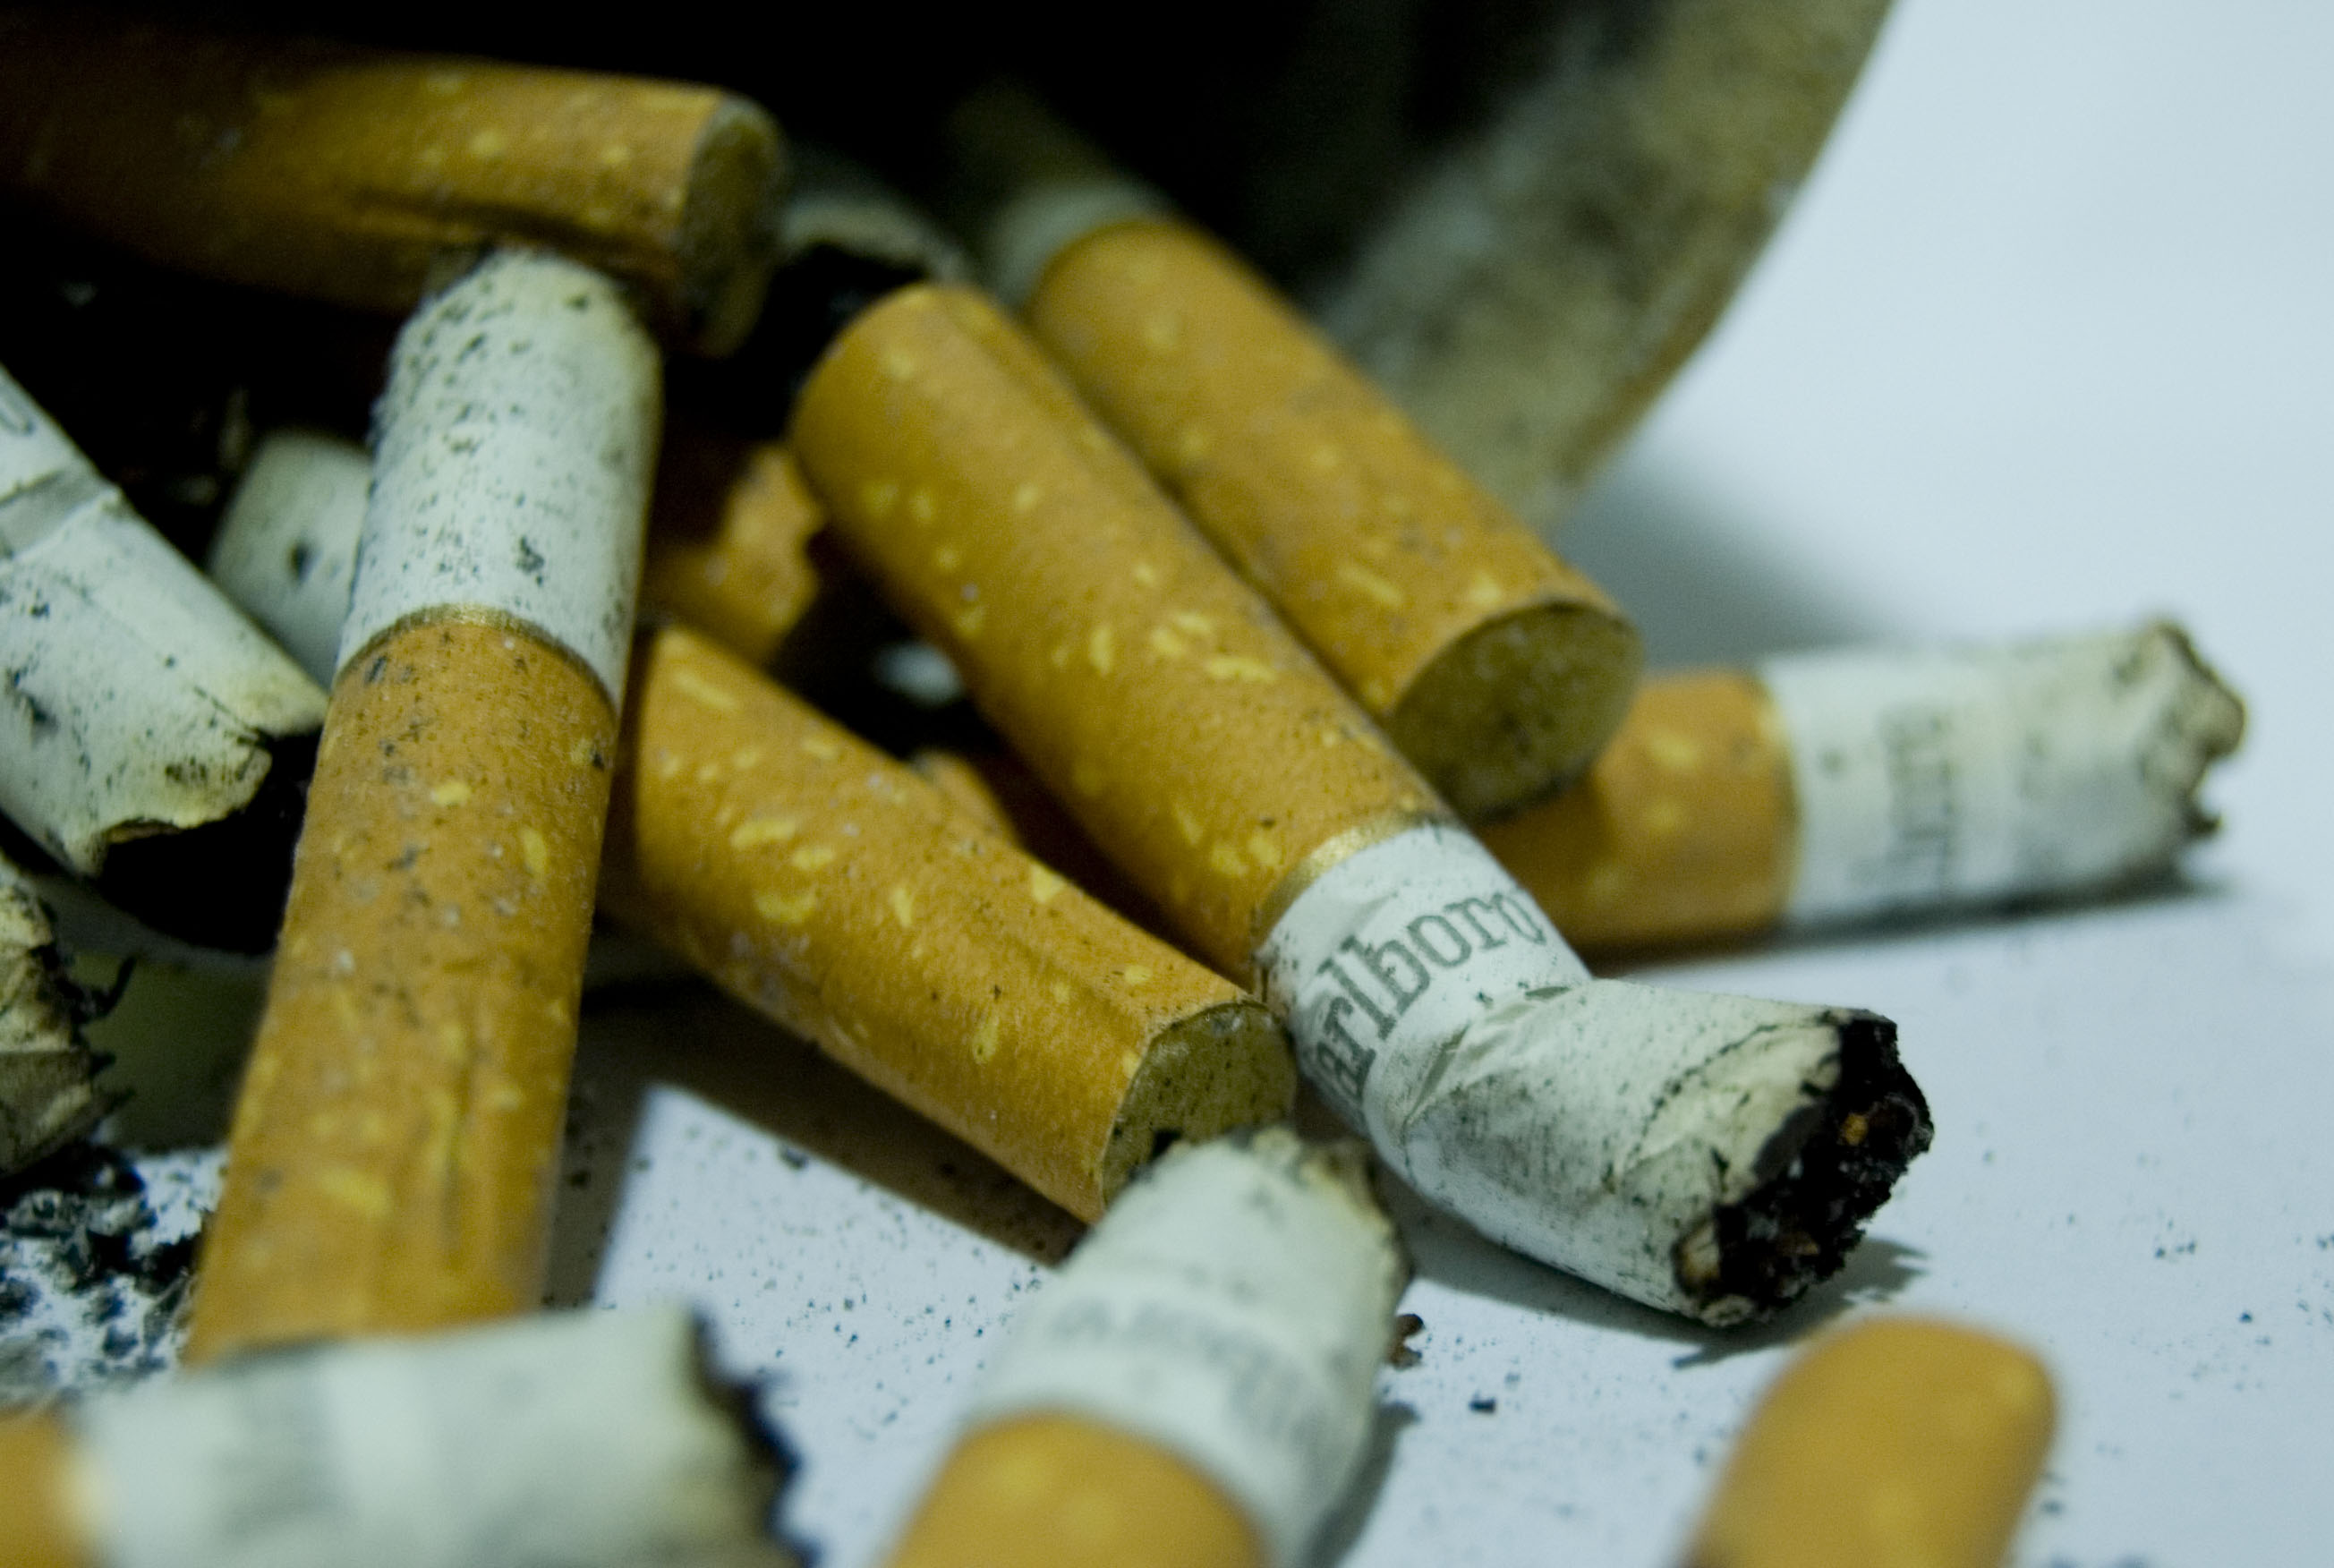 marlboro vs doral essay Cigarettes (52) cigarette papers (3) marlboro smooth menthol box 1 carton in club only select a club doral silver 100s 1 carton.